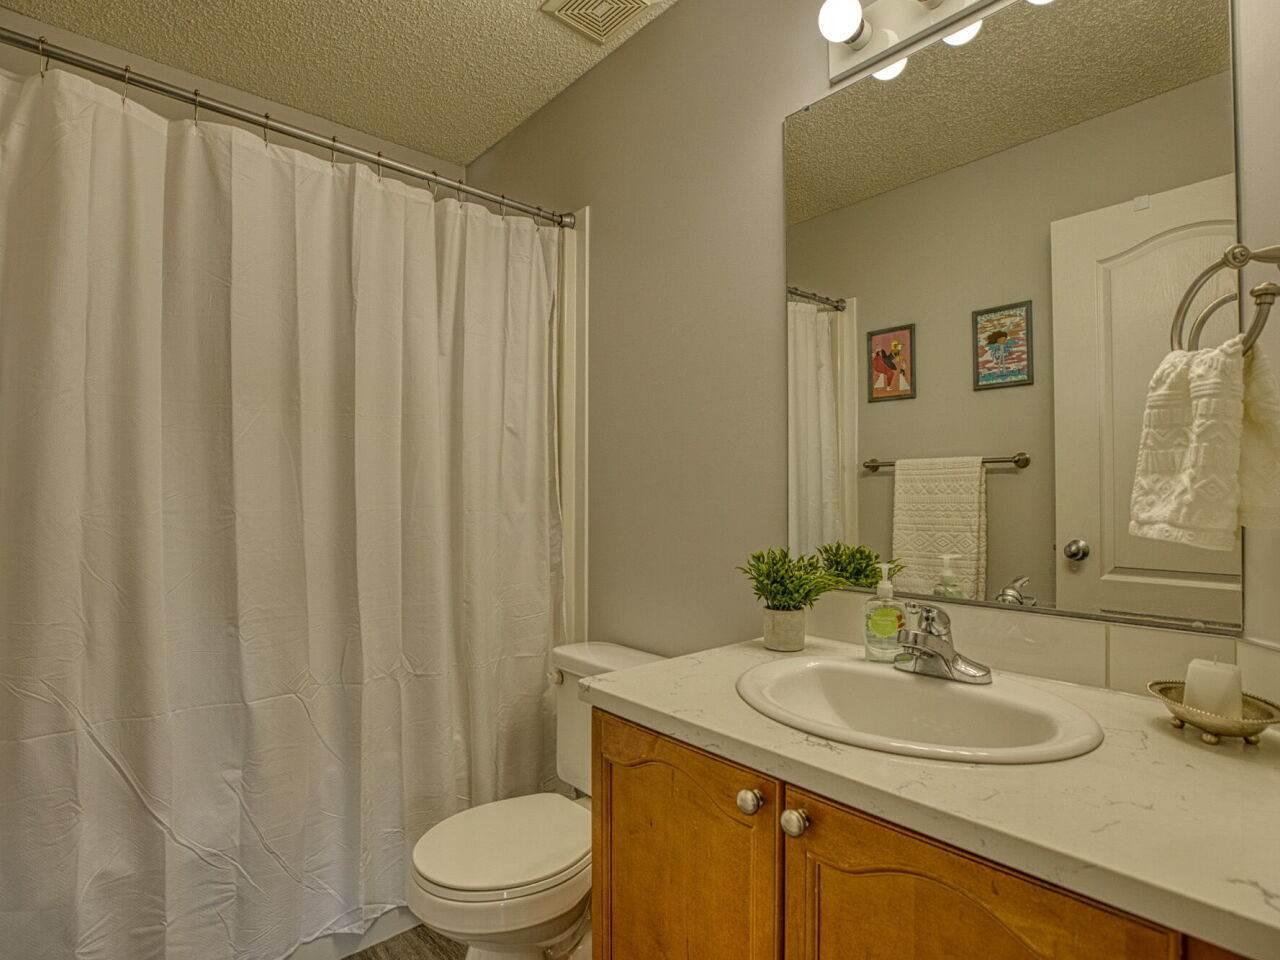 429 16807 100 Avenue - Glenwood_EDMO Lowrise Apartment for sale, 2 Bedrooms (E4234341) #18